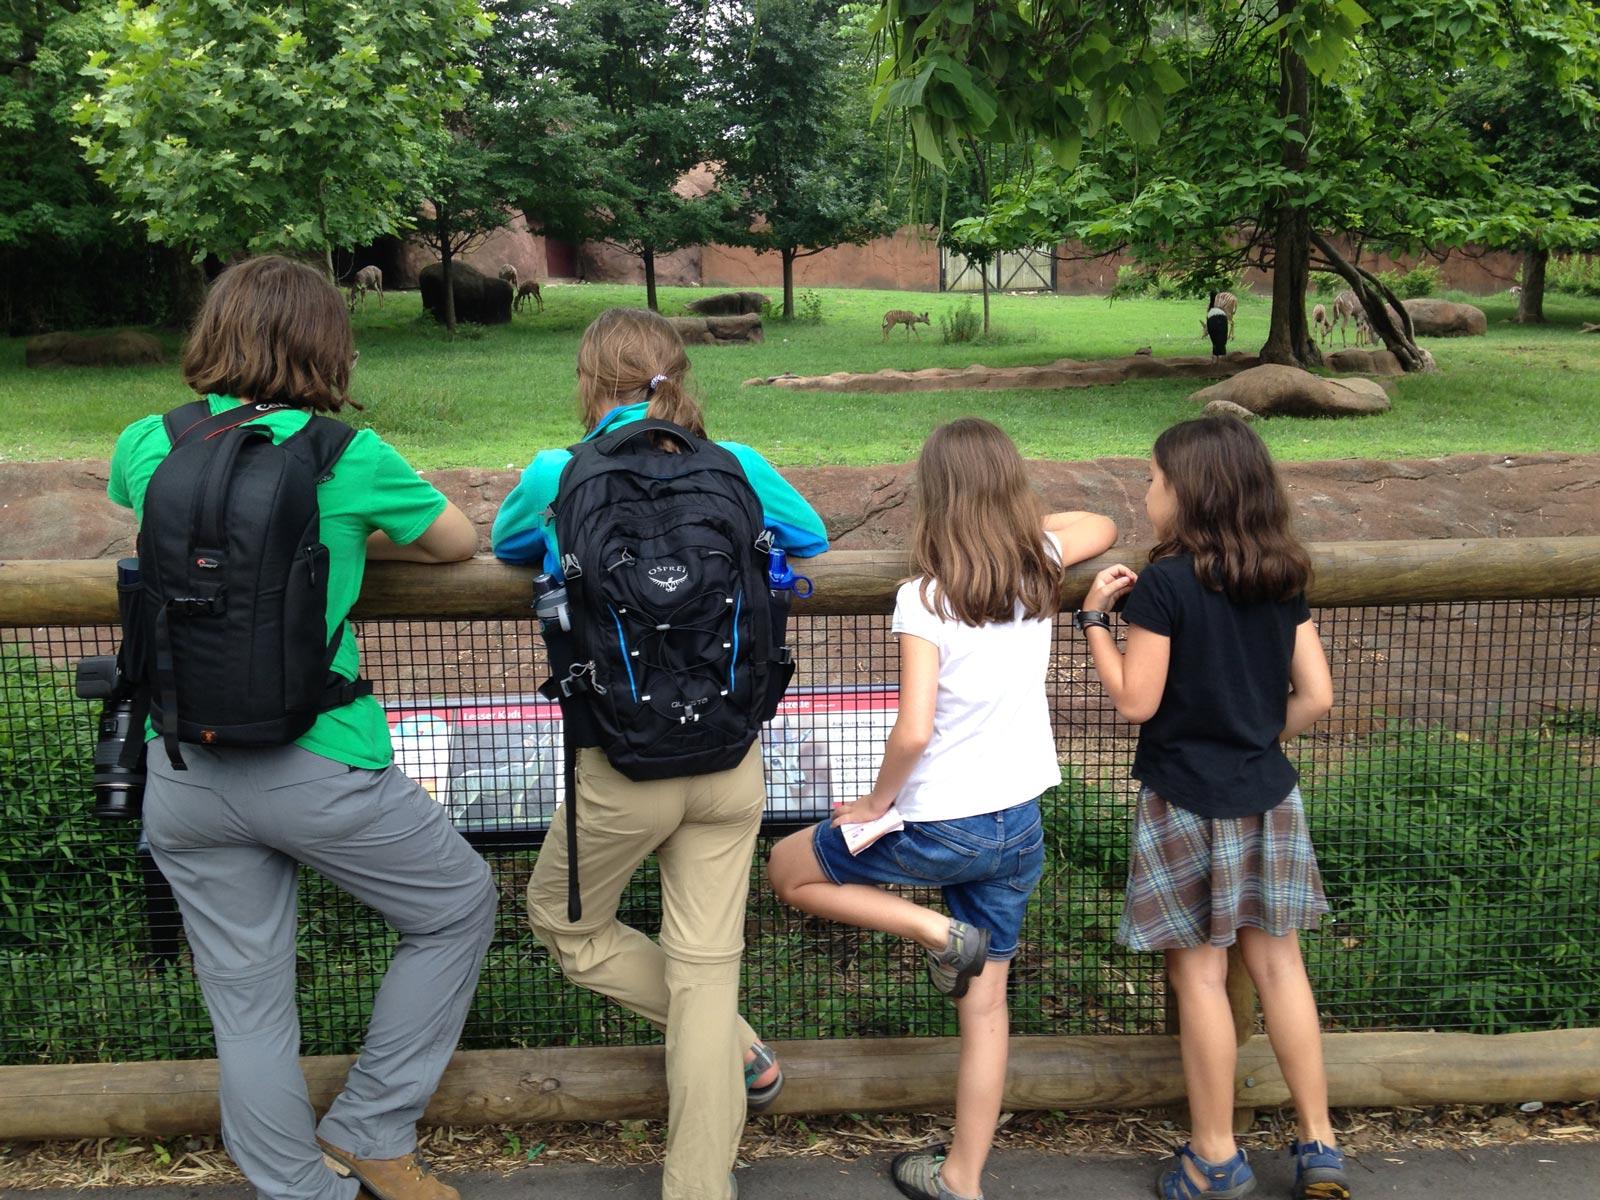 Four girls looking at an exhibit at Saint Louis Zoo in Saint Louis, Missouri